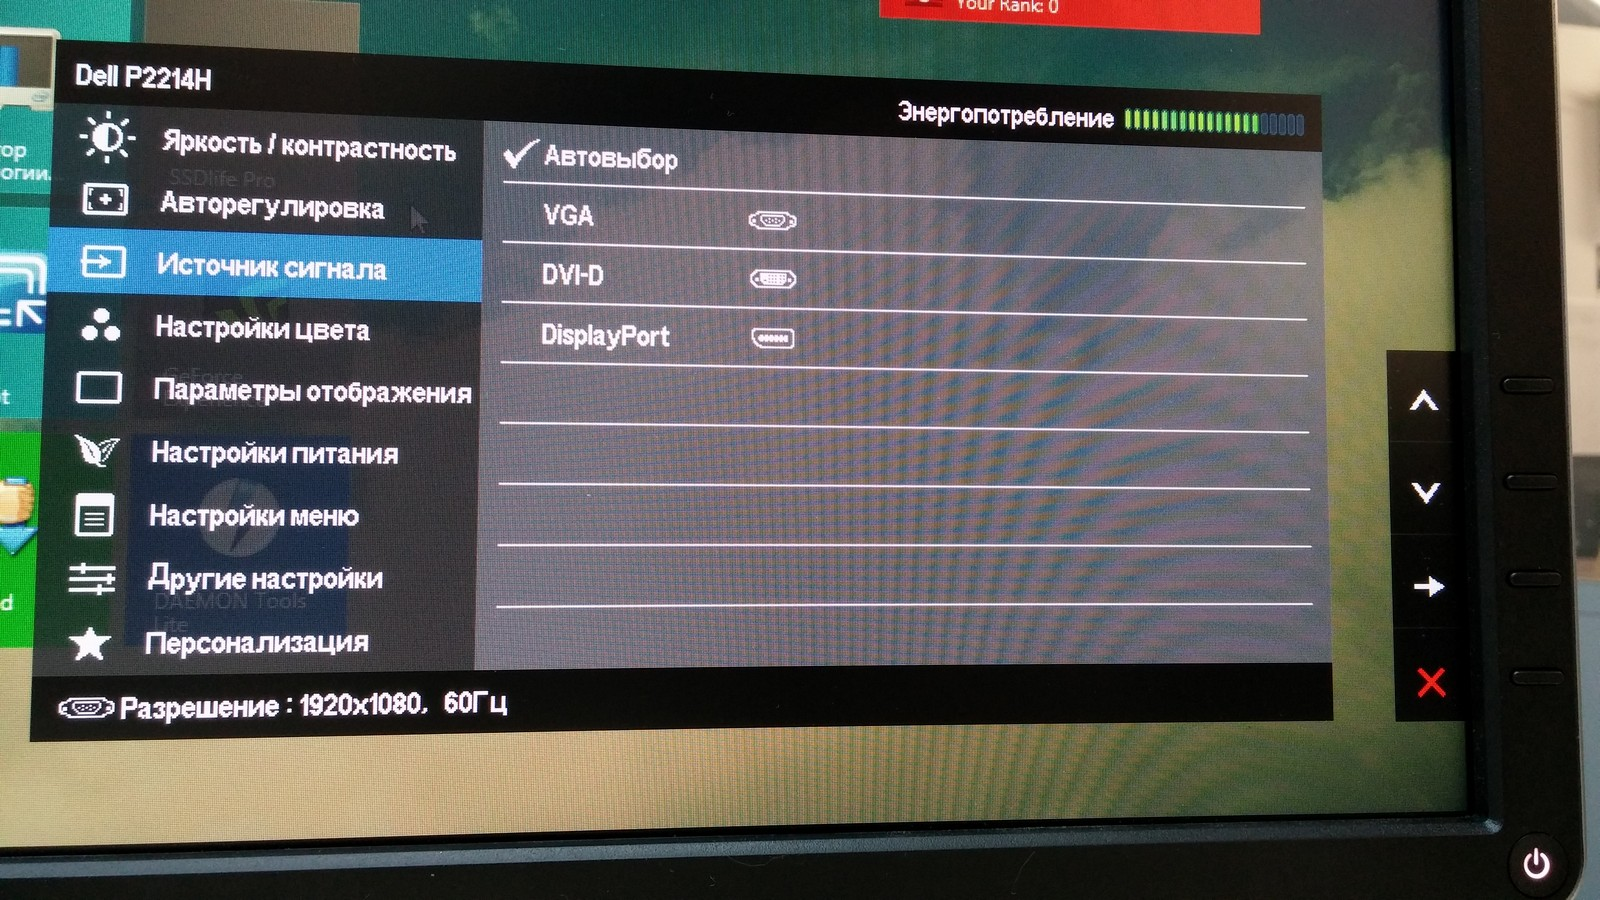 Dell P2214H - меню настроек